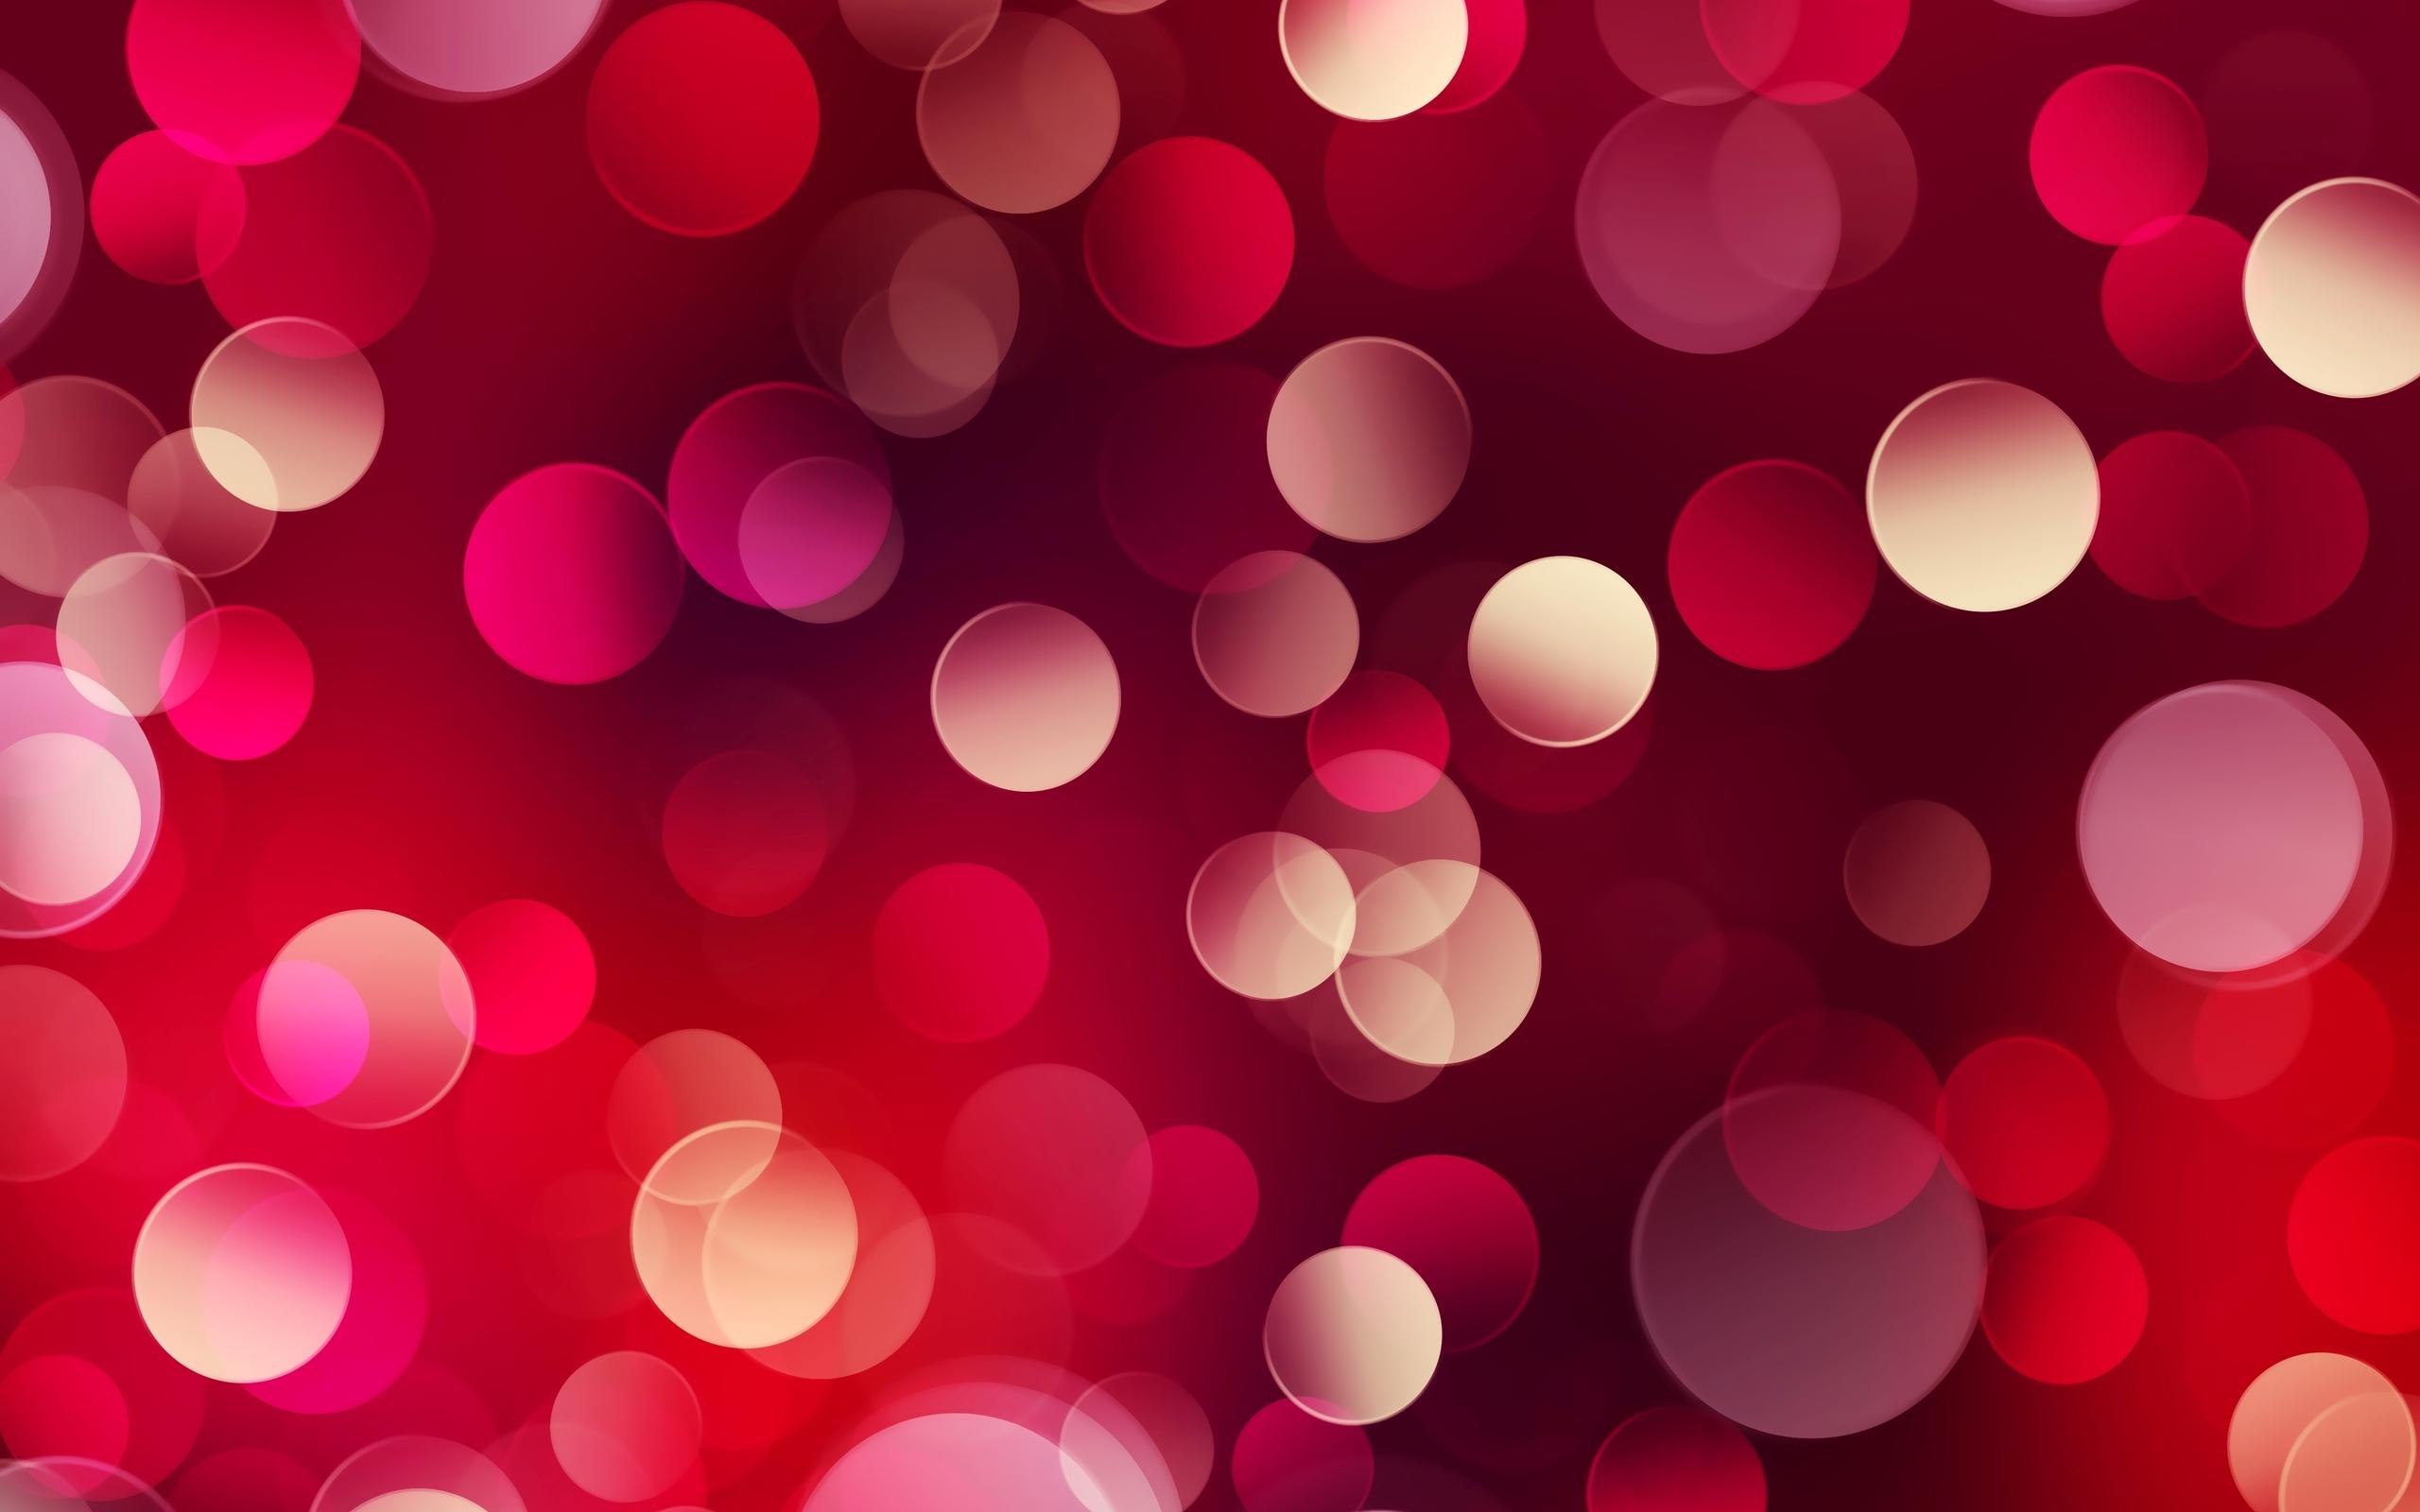 Red Light Bokeh Wallpapers 2560x1600 832753